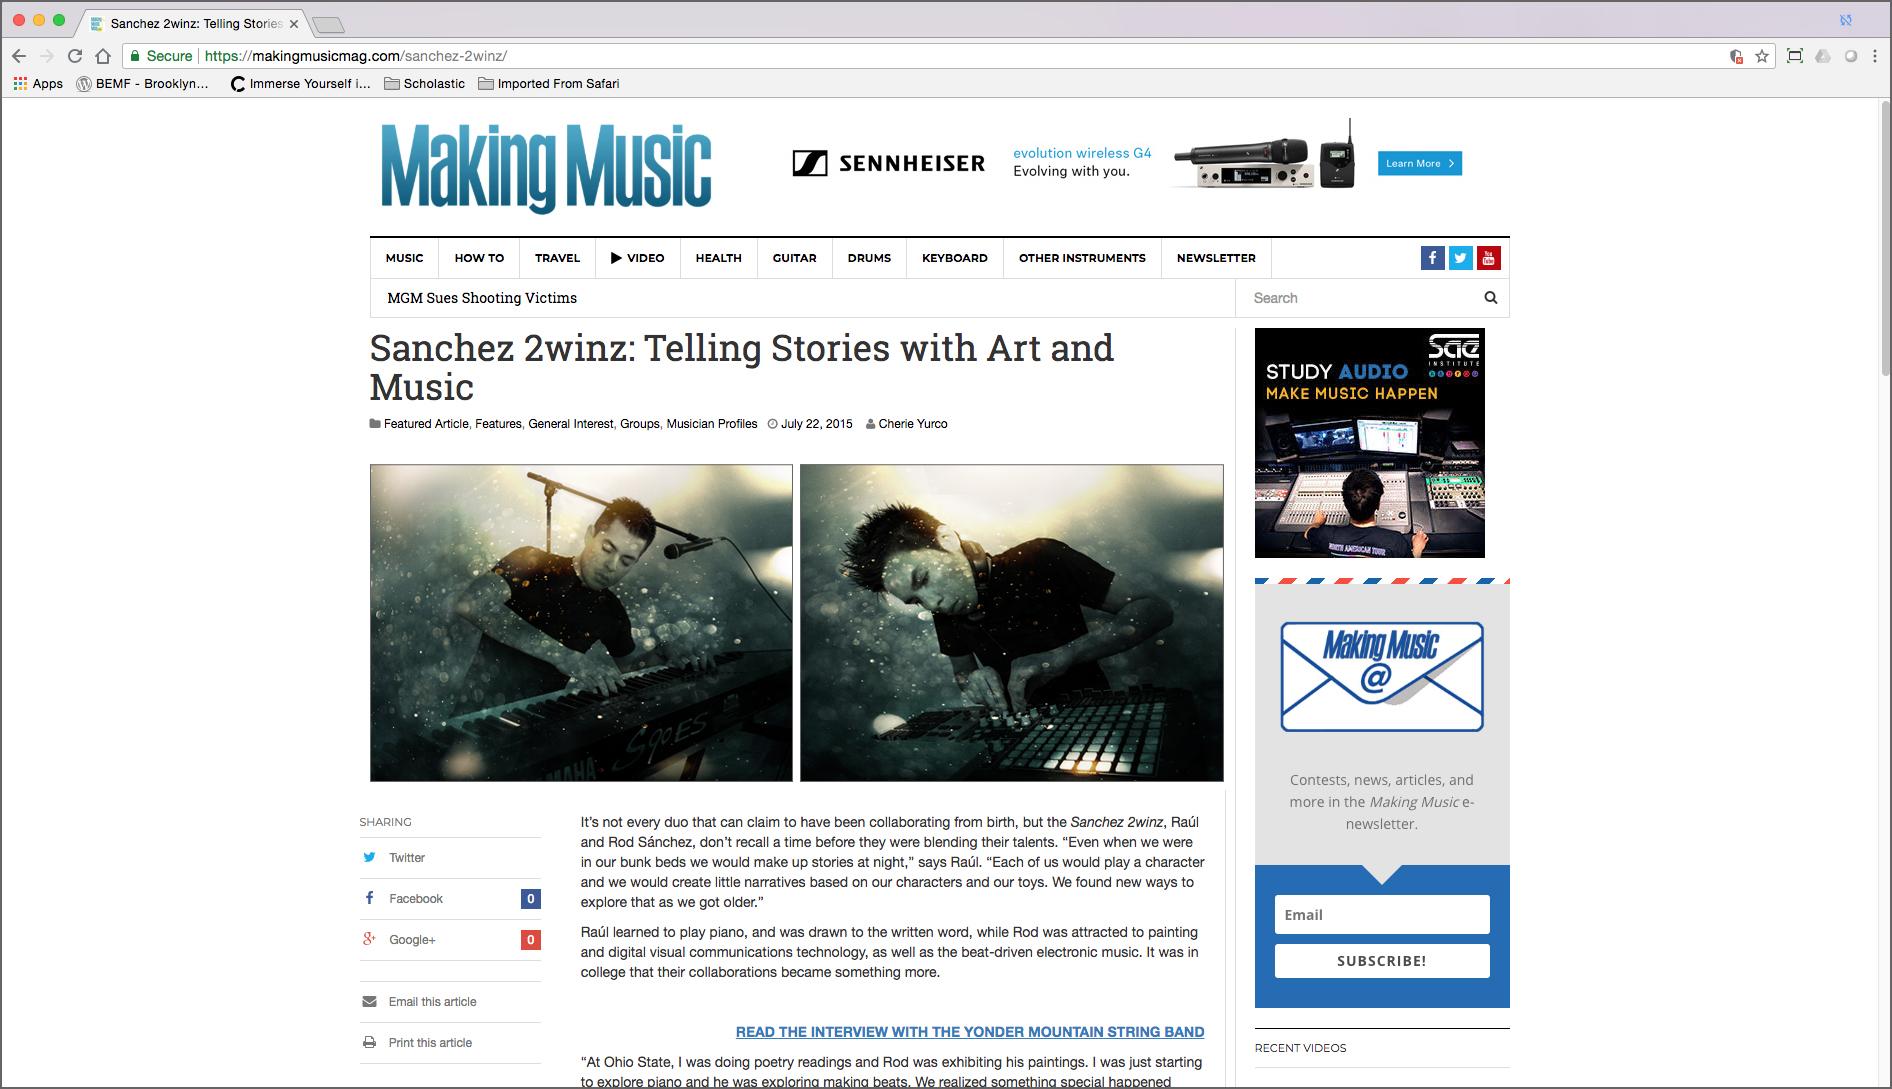 News_MakingMusicMagazine_Sanchez2winzTellingStoriesArtMusic_RaulSanchez_RodSanchez_Sanchez2winz.jpg